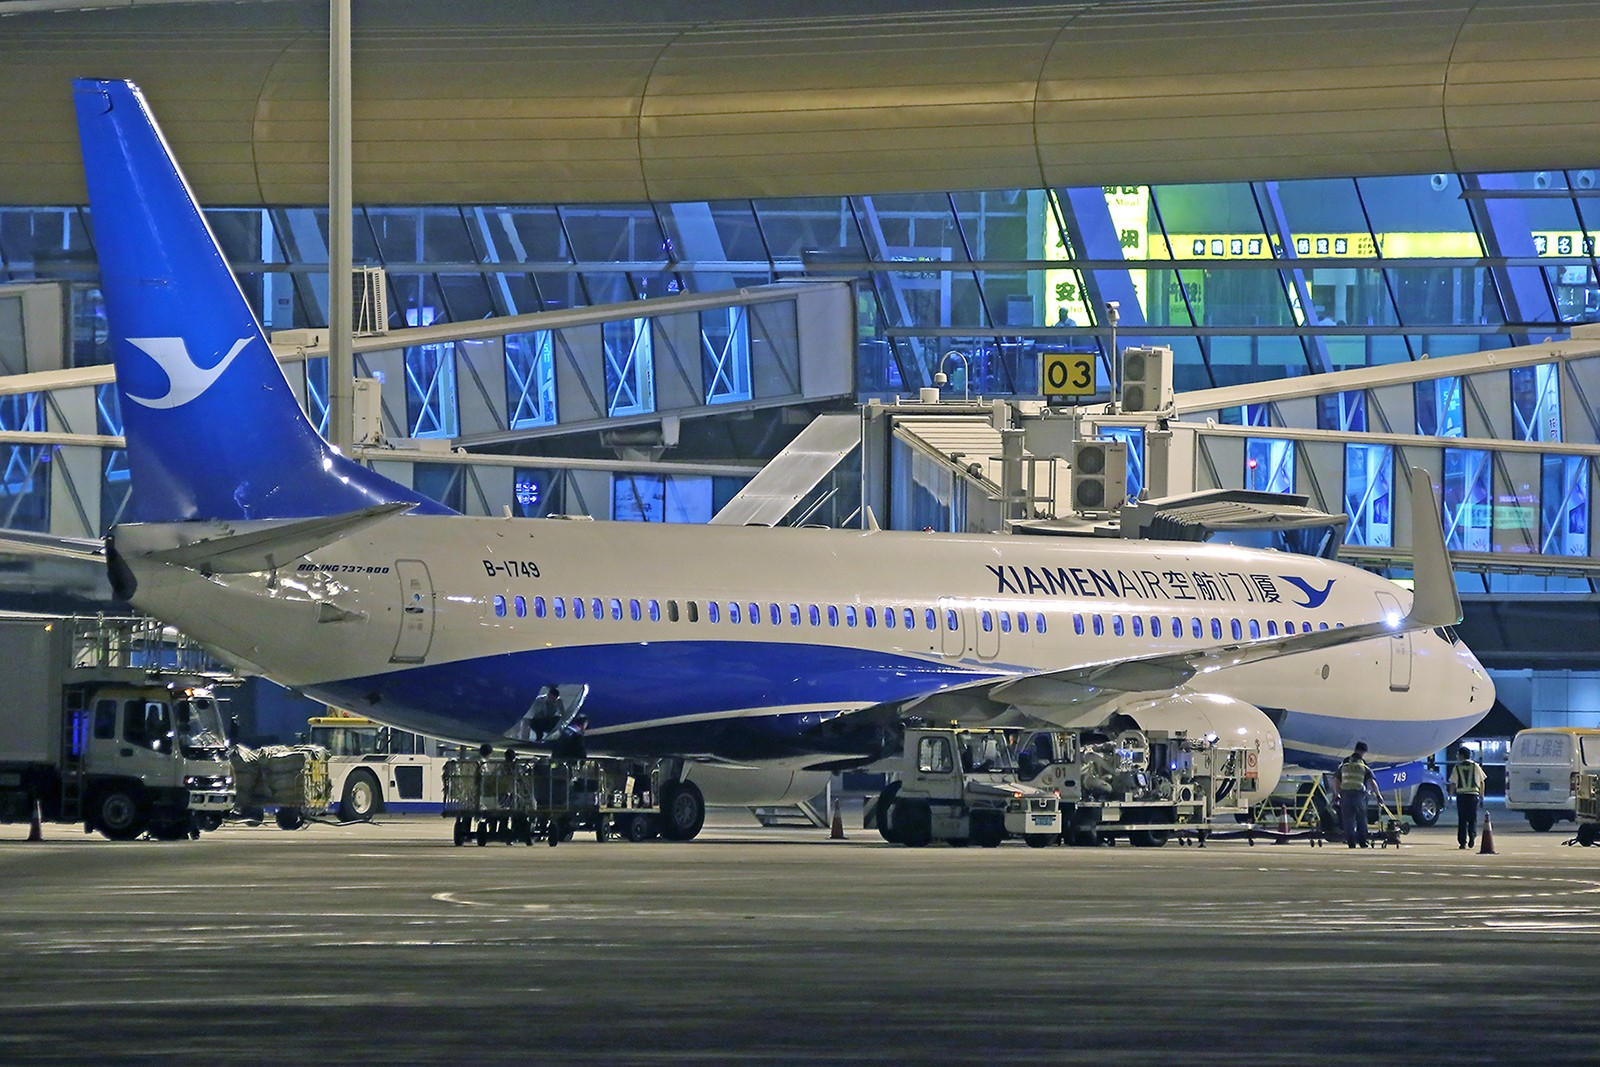 Re:[原创][合肥飞友会]霸都打鸡 找个机会白天打华航 顺便看看期待已久的迪斯尼 BOEING 737-800 B-1749 中国合肥新桥国际机场